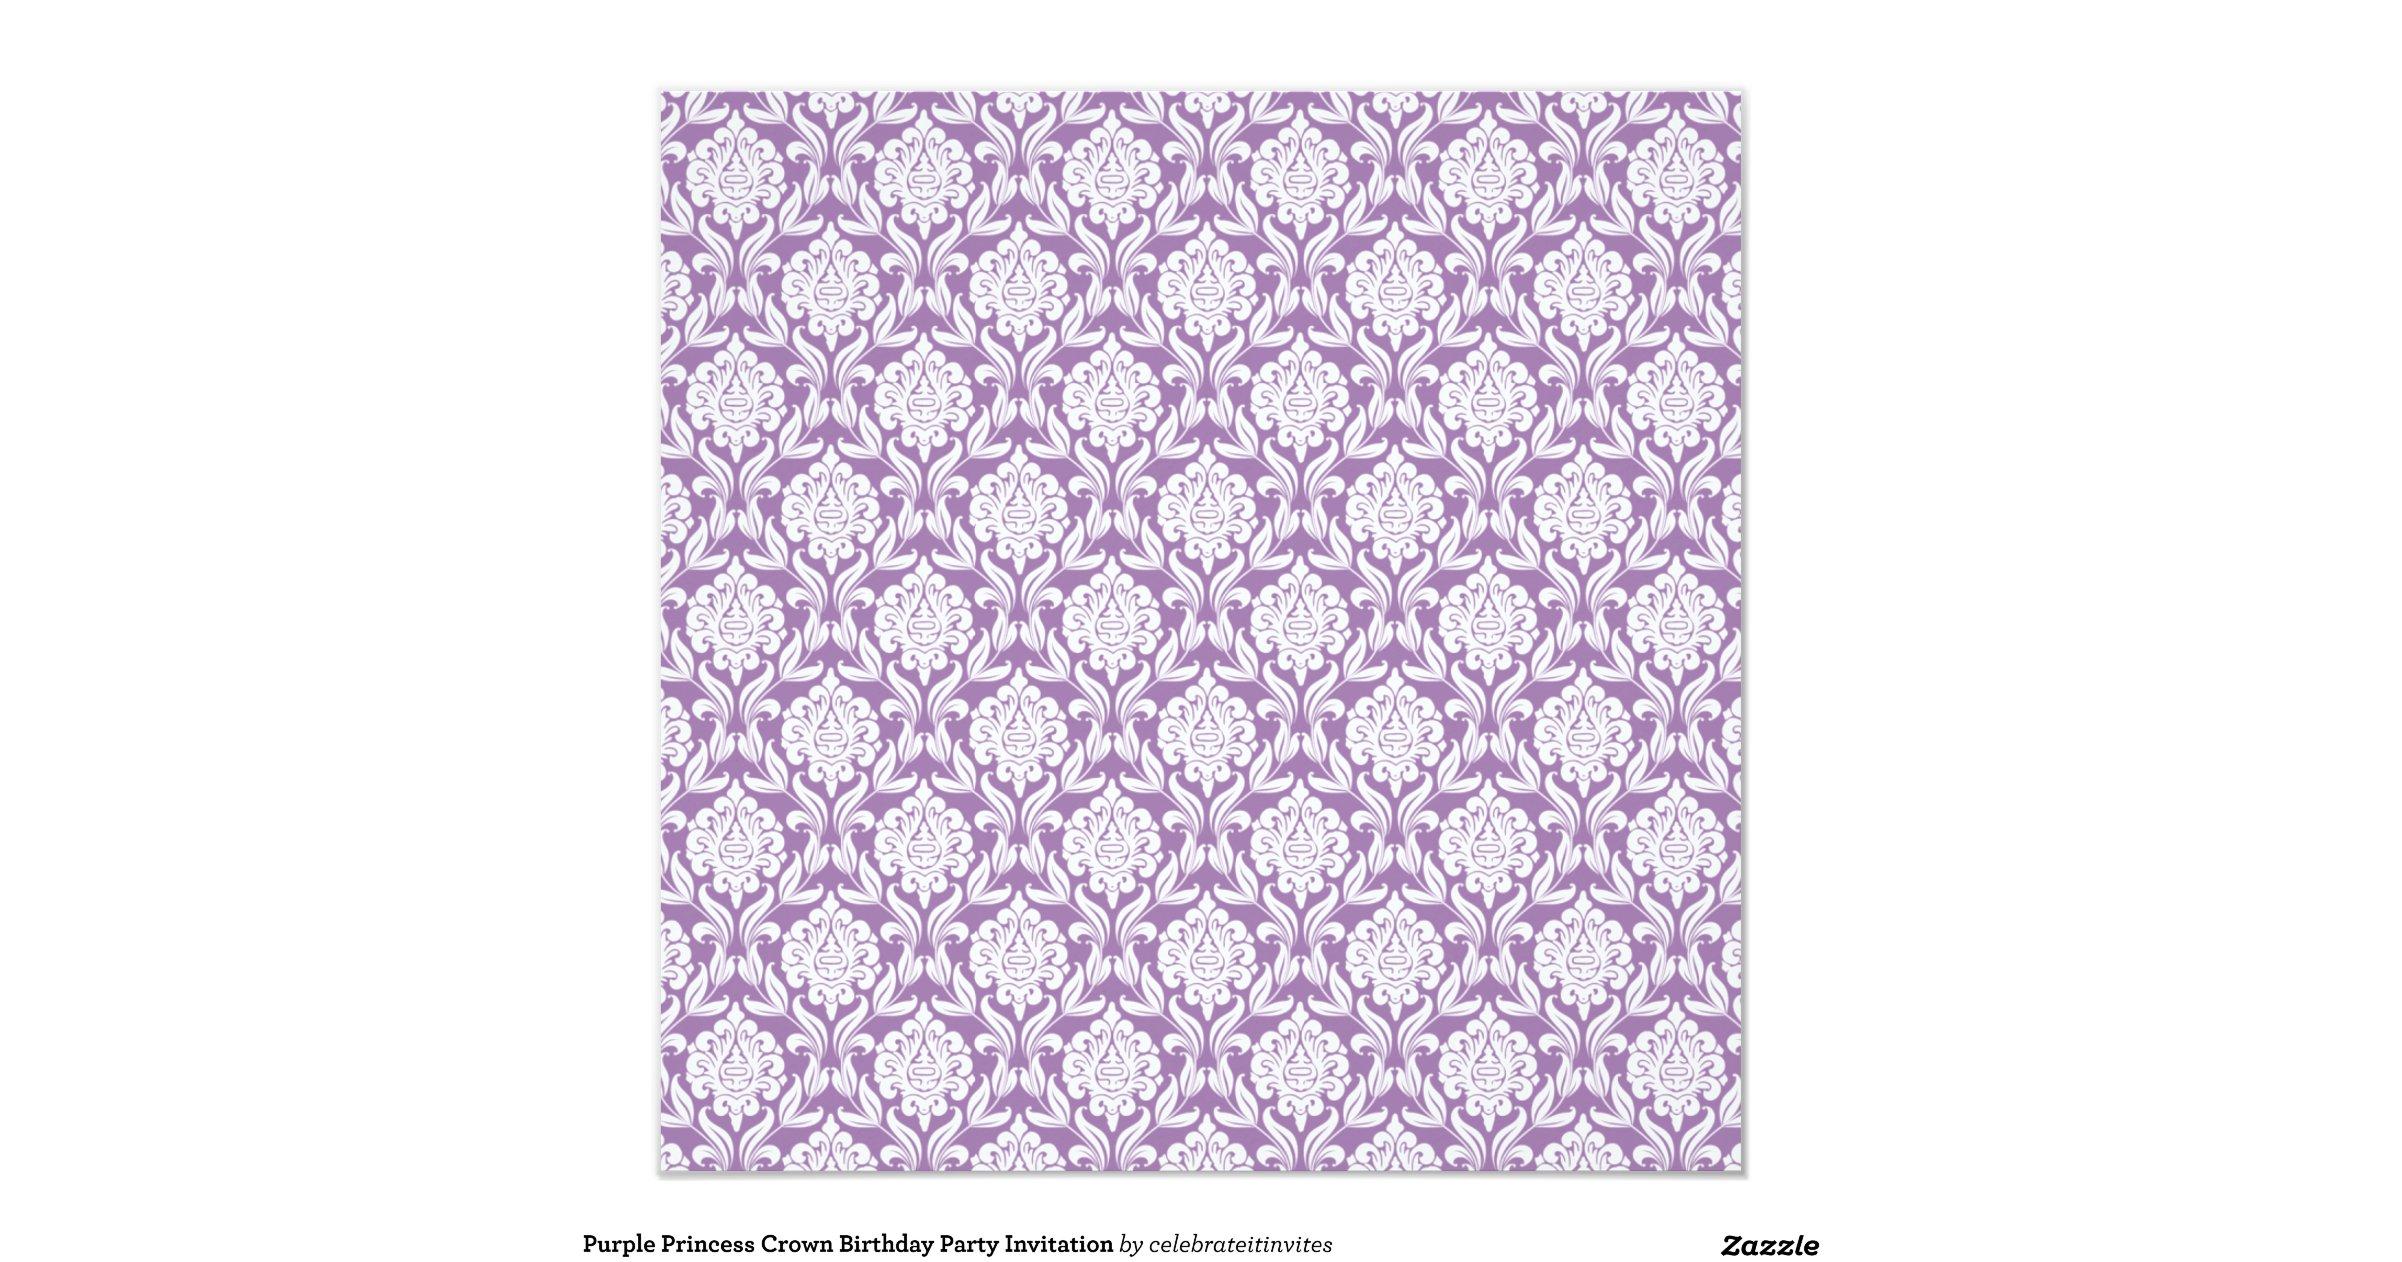 purple_princess_crown_birthday_party_invitation ...